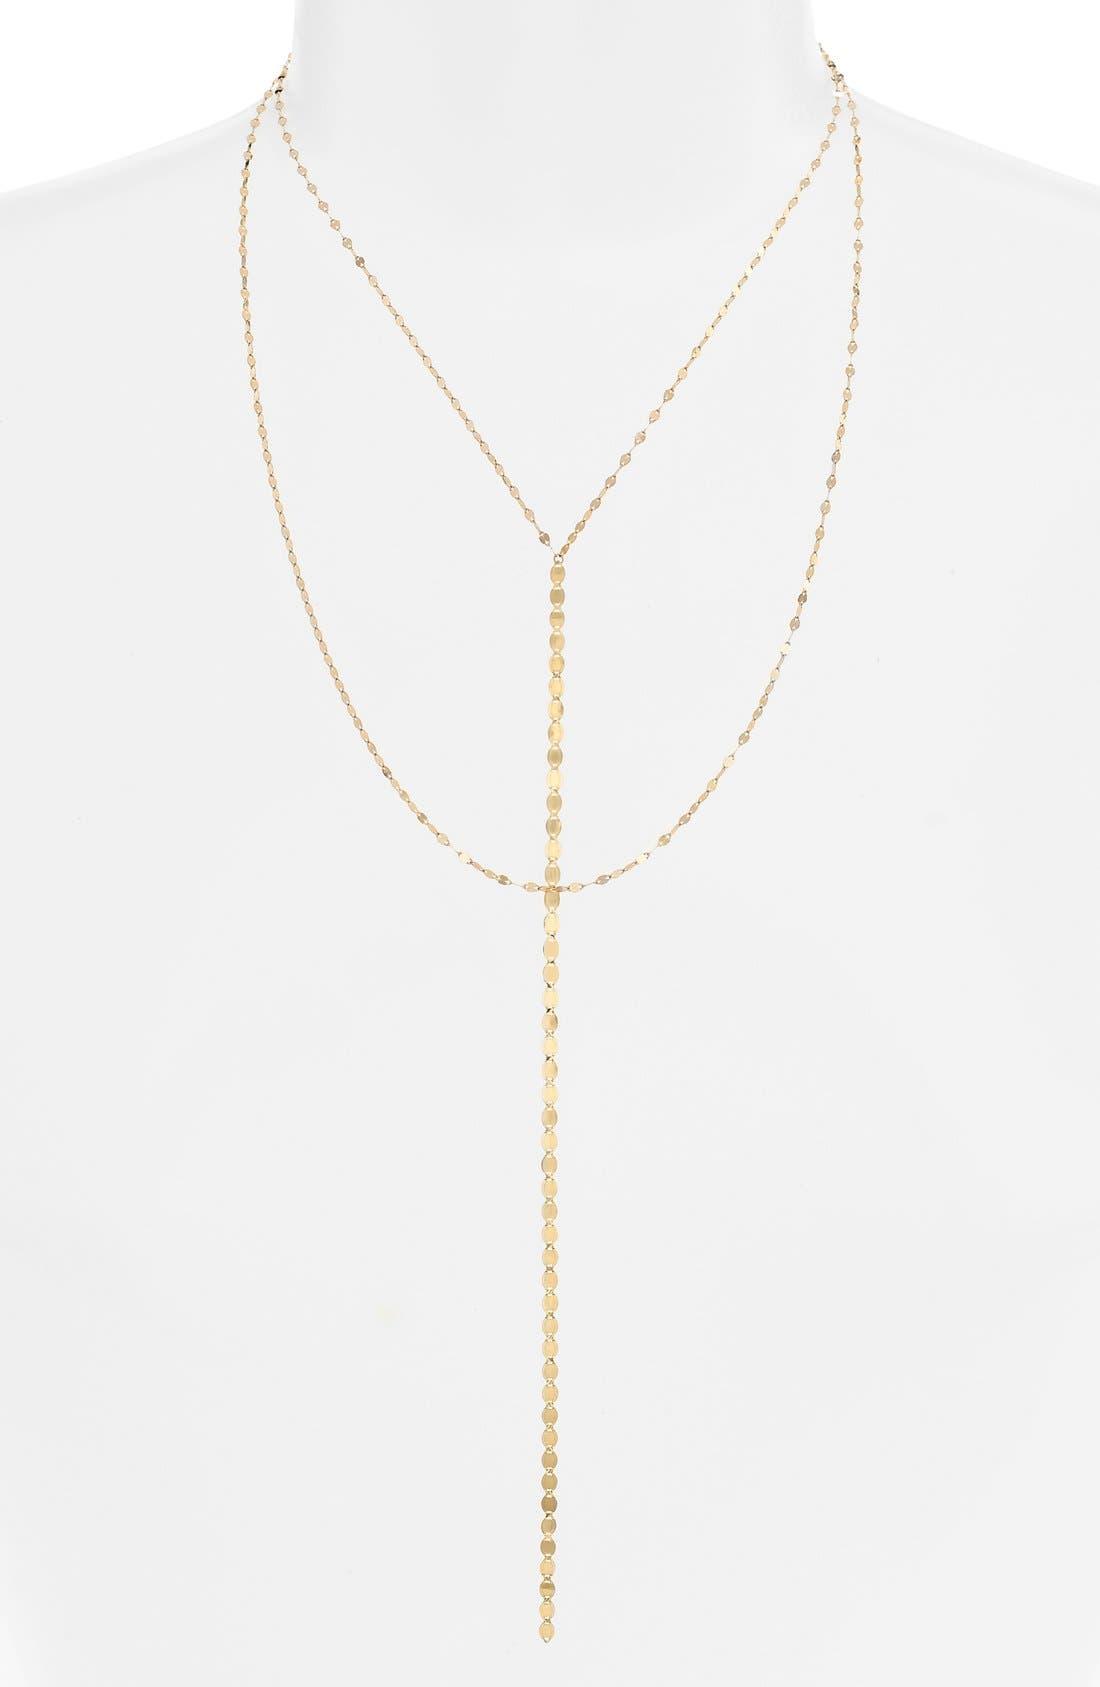 Main Image - Lana Jewelry 'Nude Blake' Multistrand Drop Necklace